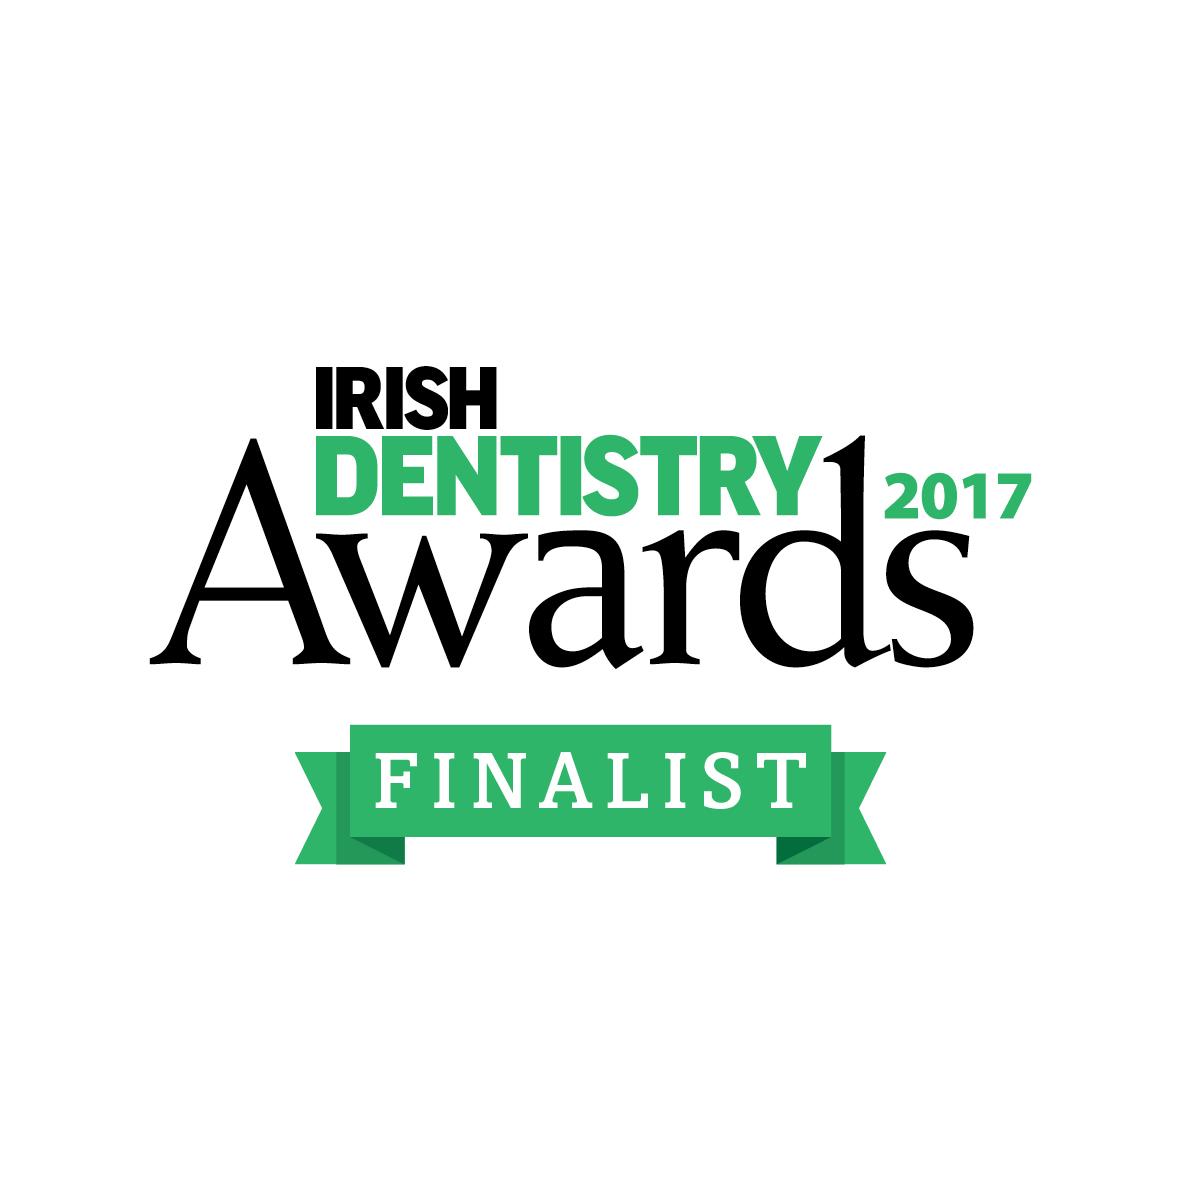 IRISH DENTISTRY AWARDS 2017 FINALIST!